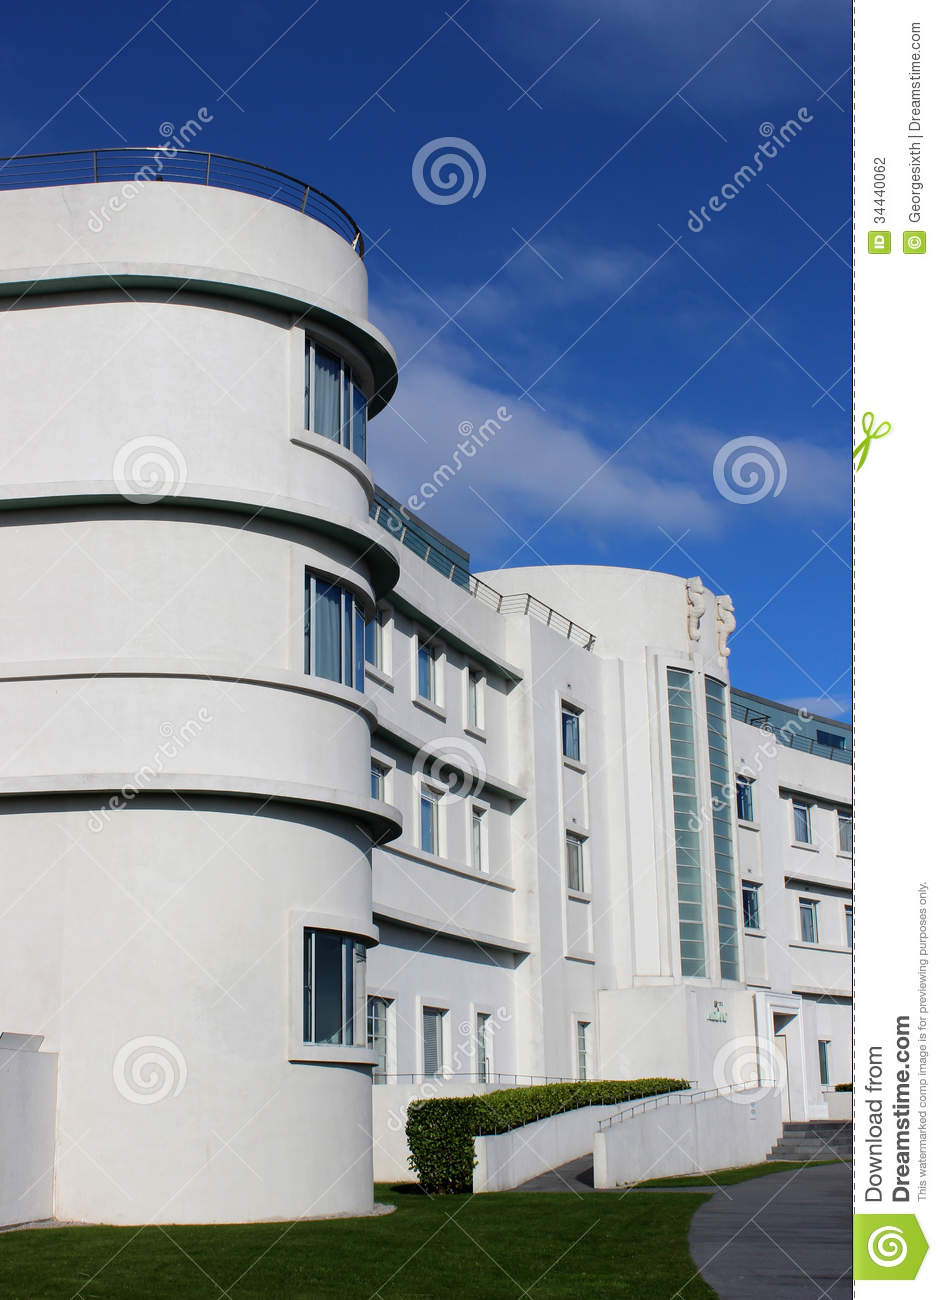 Iconic Art Deco Midland Hotel Morecambe Lancashire Stock.